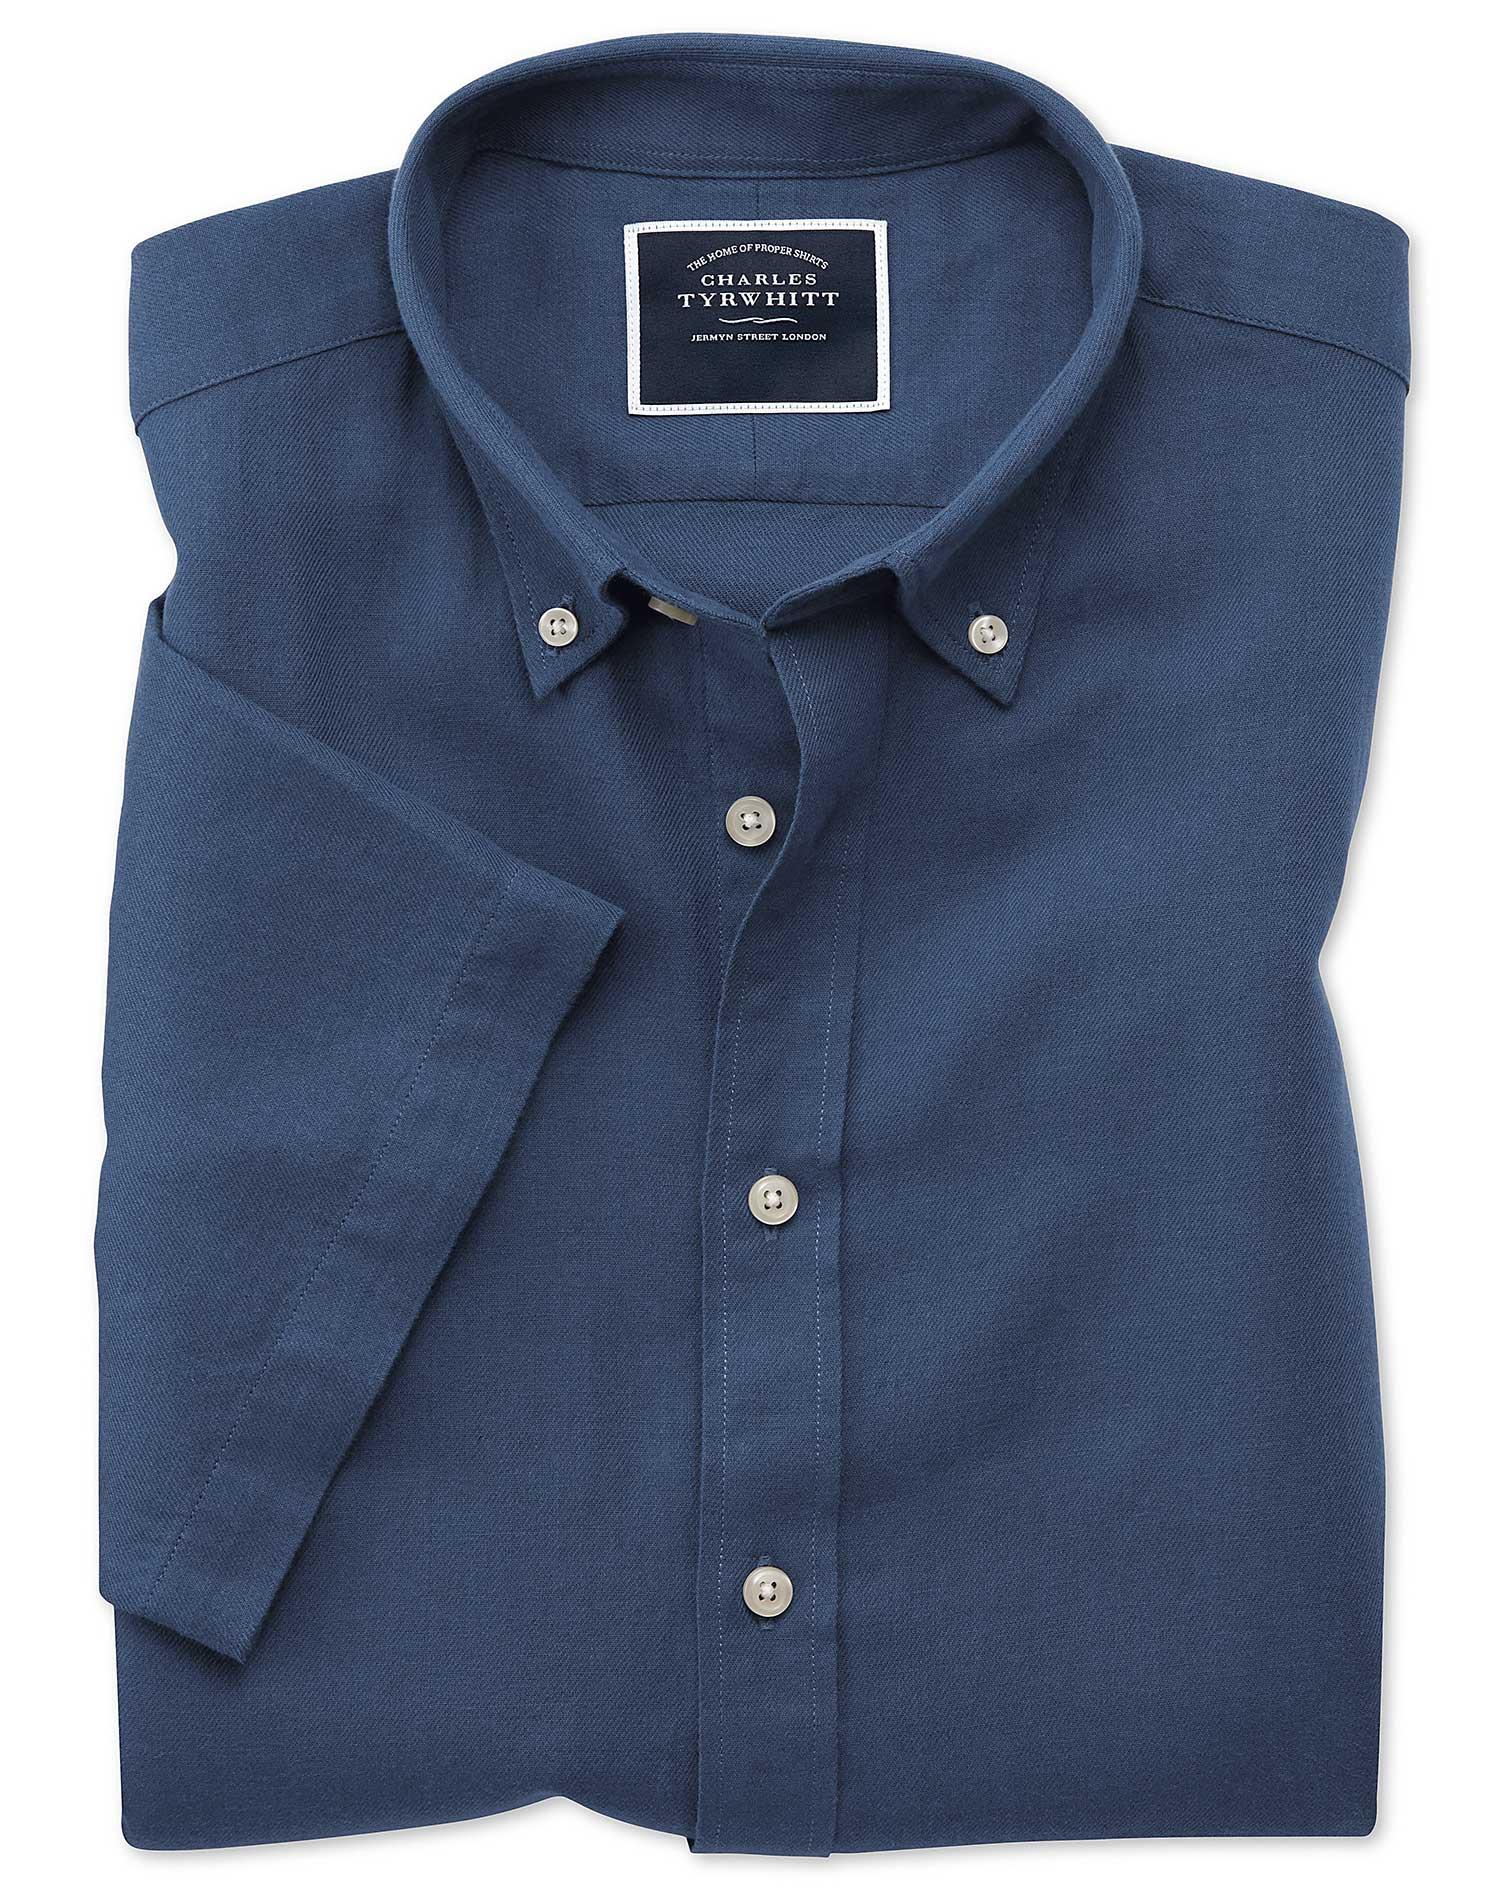 Classic Fit Dark Blue Cotton Linen Twill Short Sleeve Shirt Single Cuff Size XL by Charles Tyrwhitt